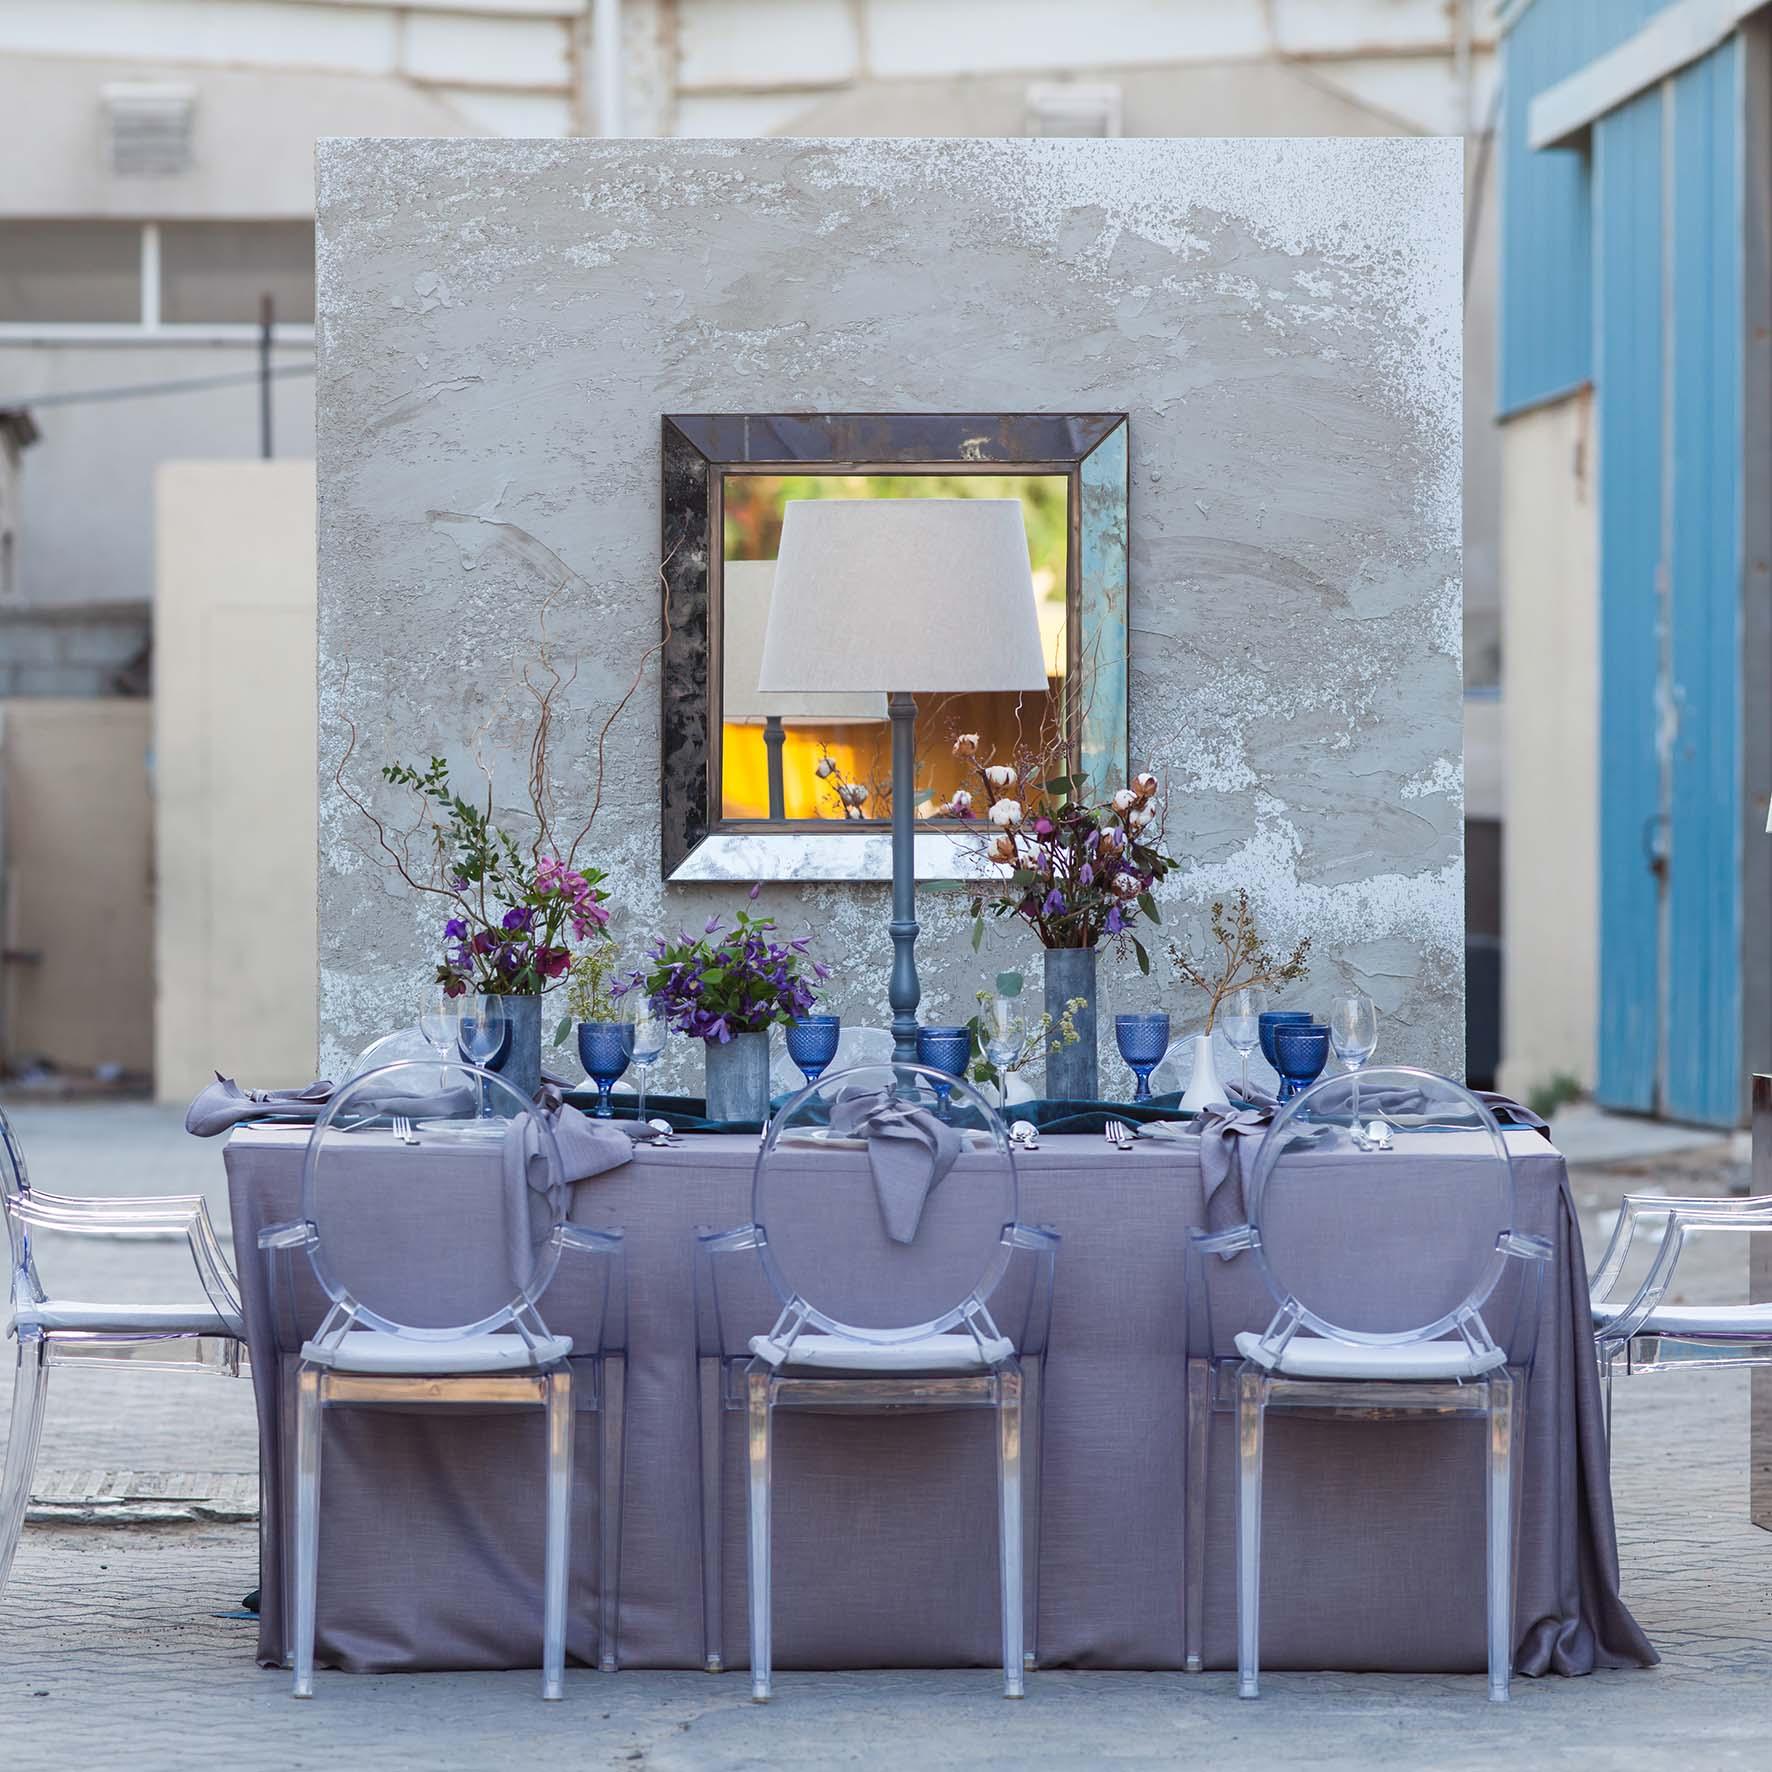 Cordless Lamps - Event Rental Dubai - Epsom